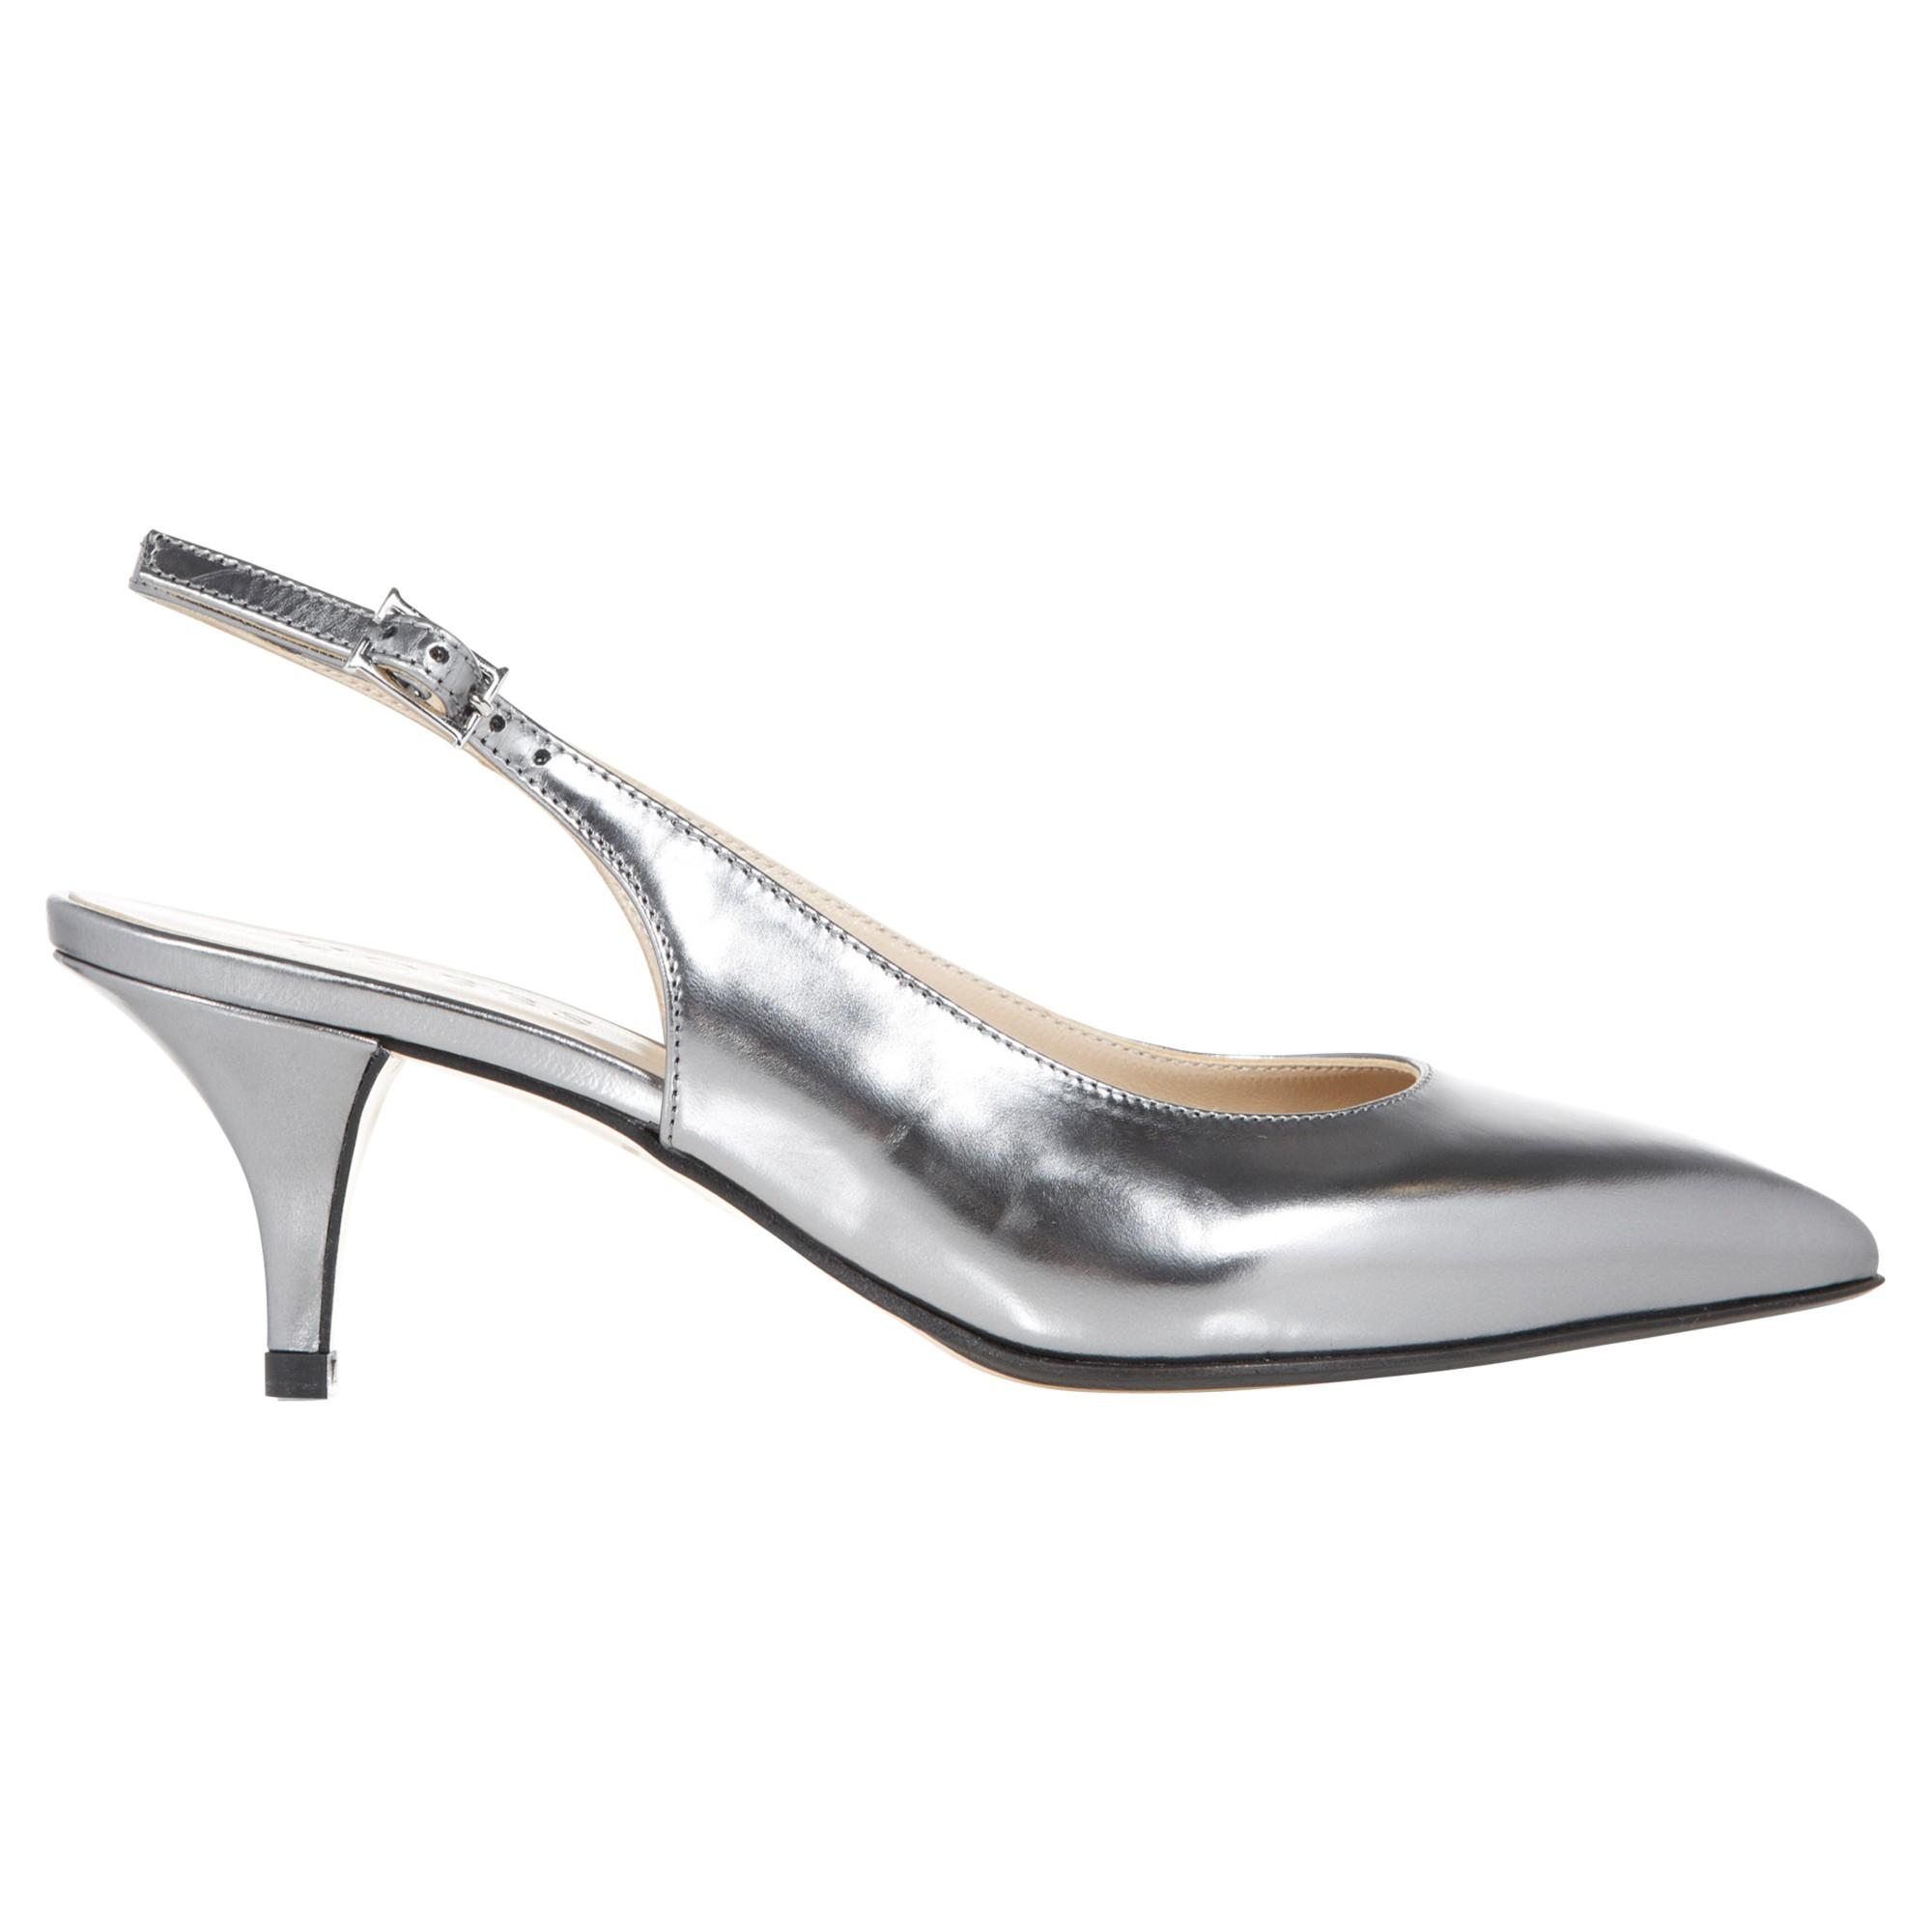 3baa02baa31 Hobbs Invitation Lillian Slingback Kitten Heels in Metallic - Lyst